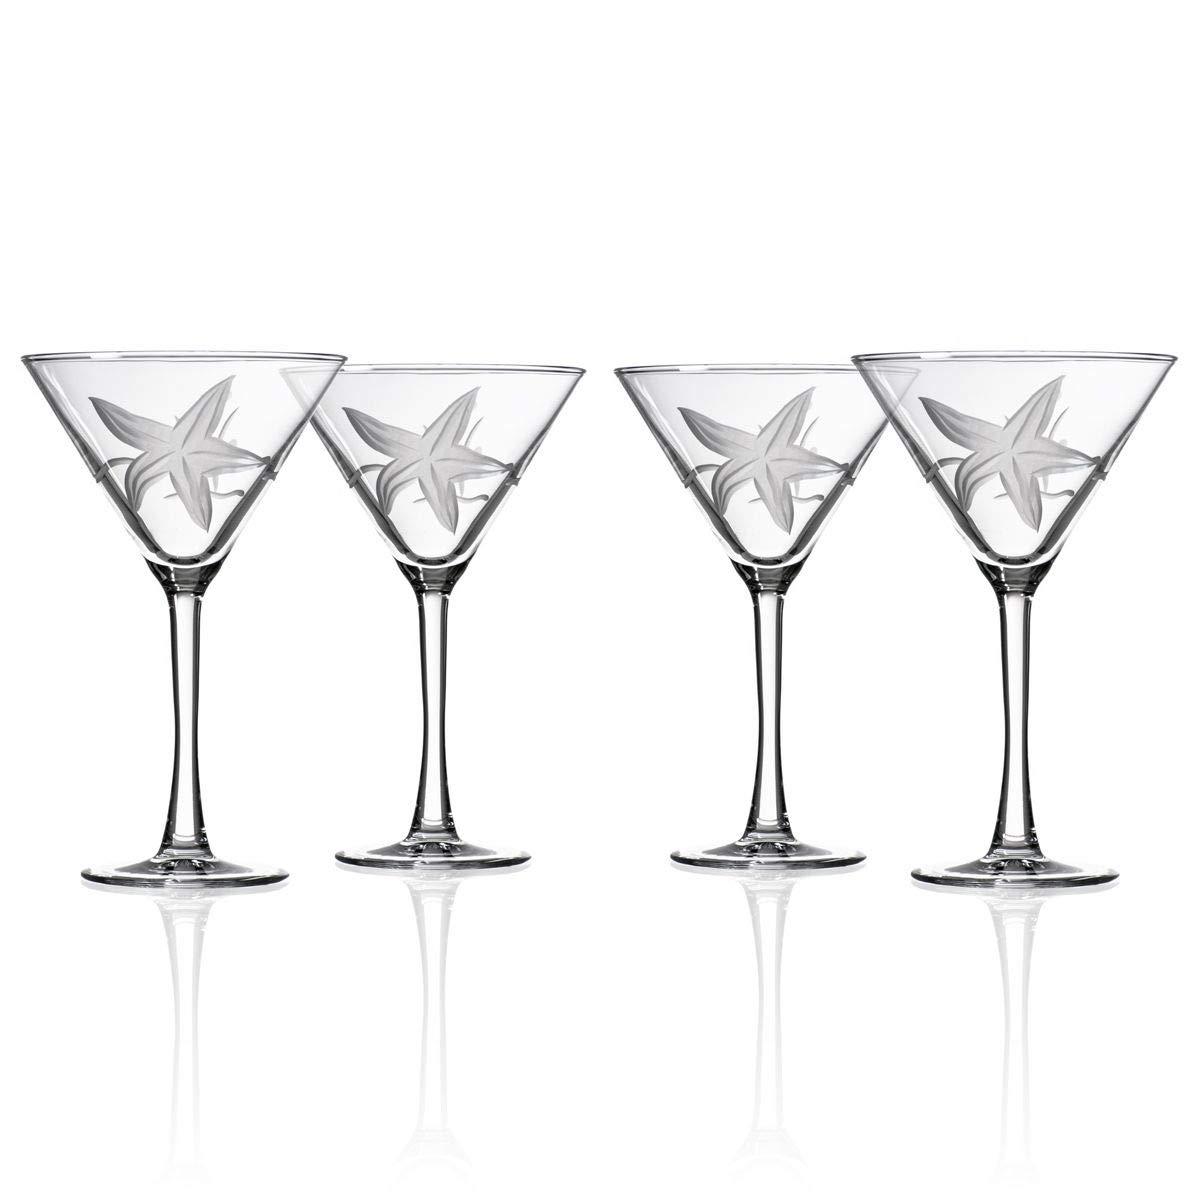 Rolf Glass Starfish Martini Glasses Set of 4, 10 Ounce